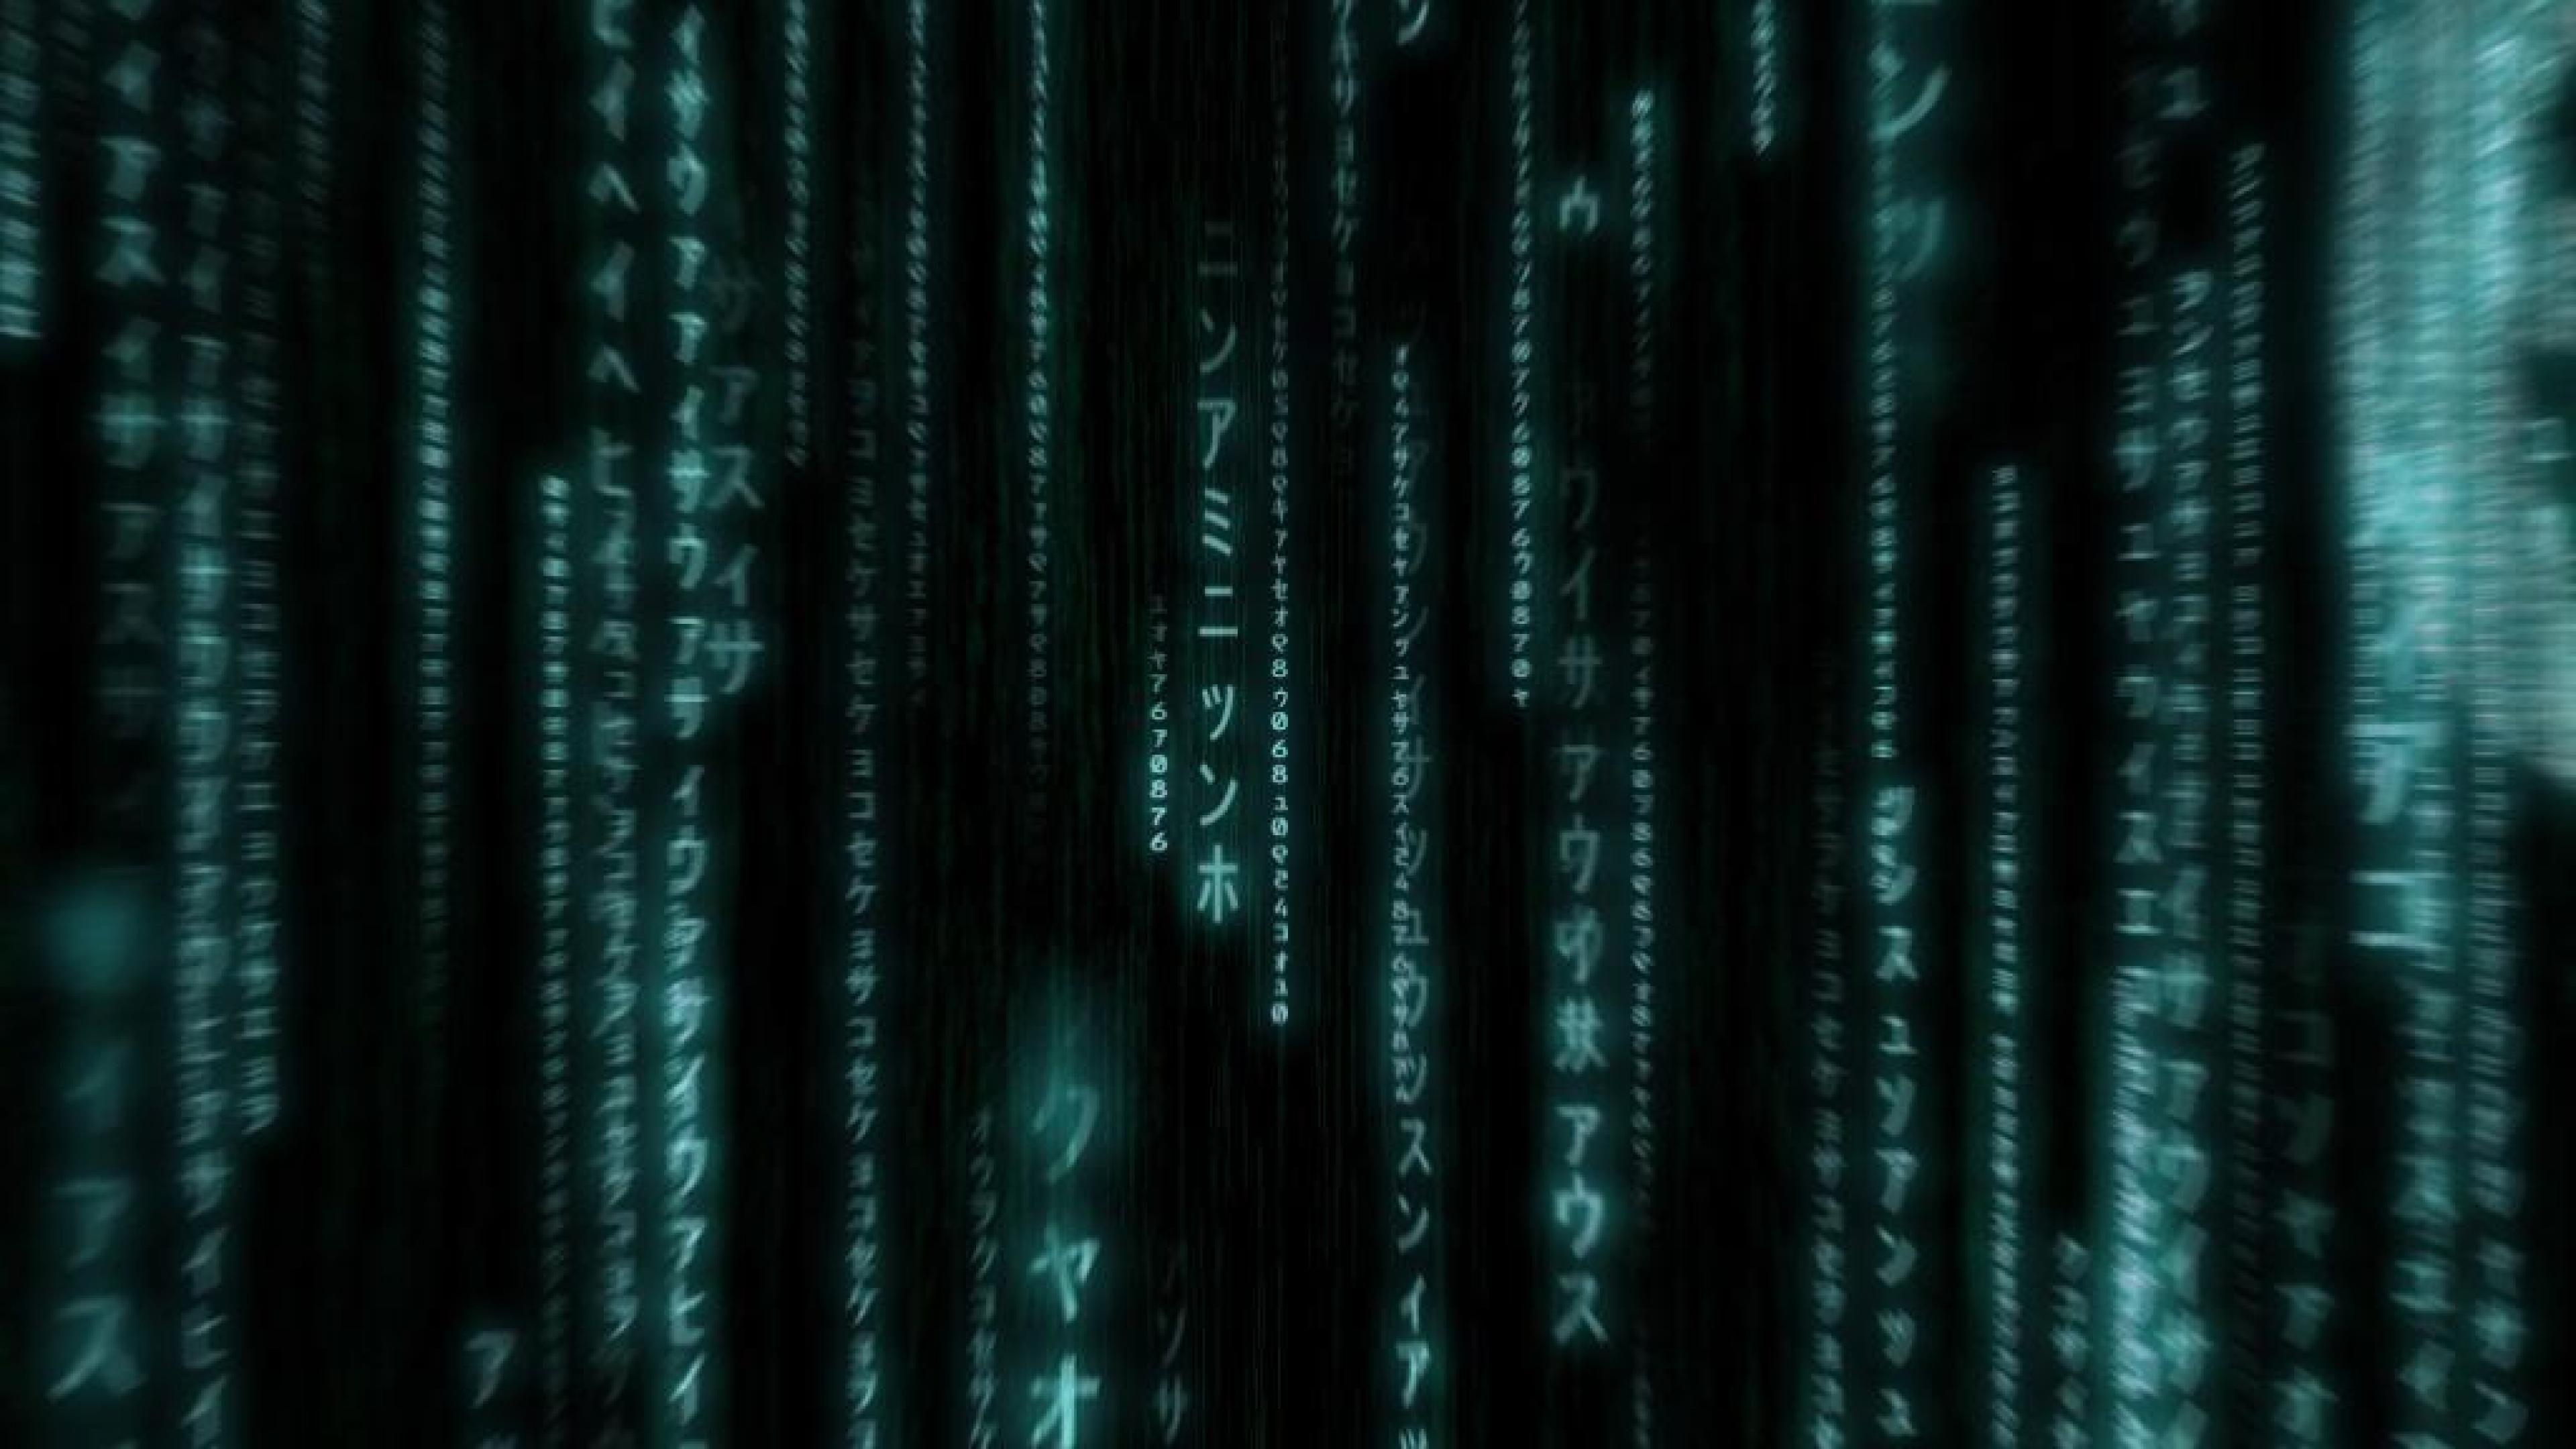 4k Matrix Wallpapers Top Free 4k Matrix Backgrounds